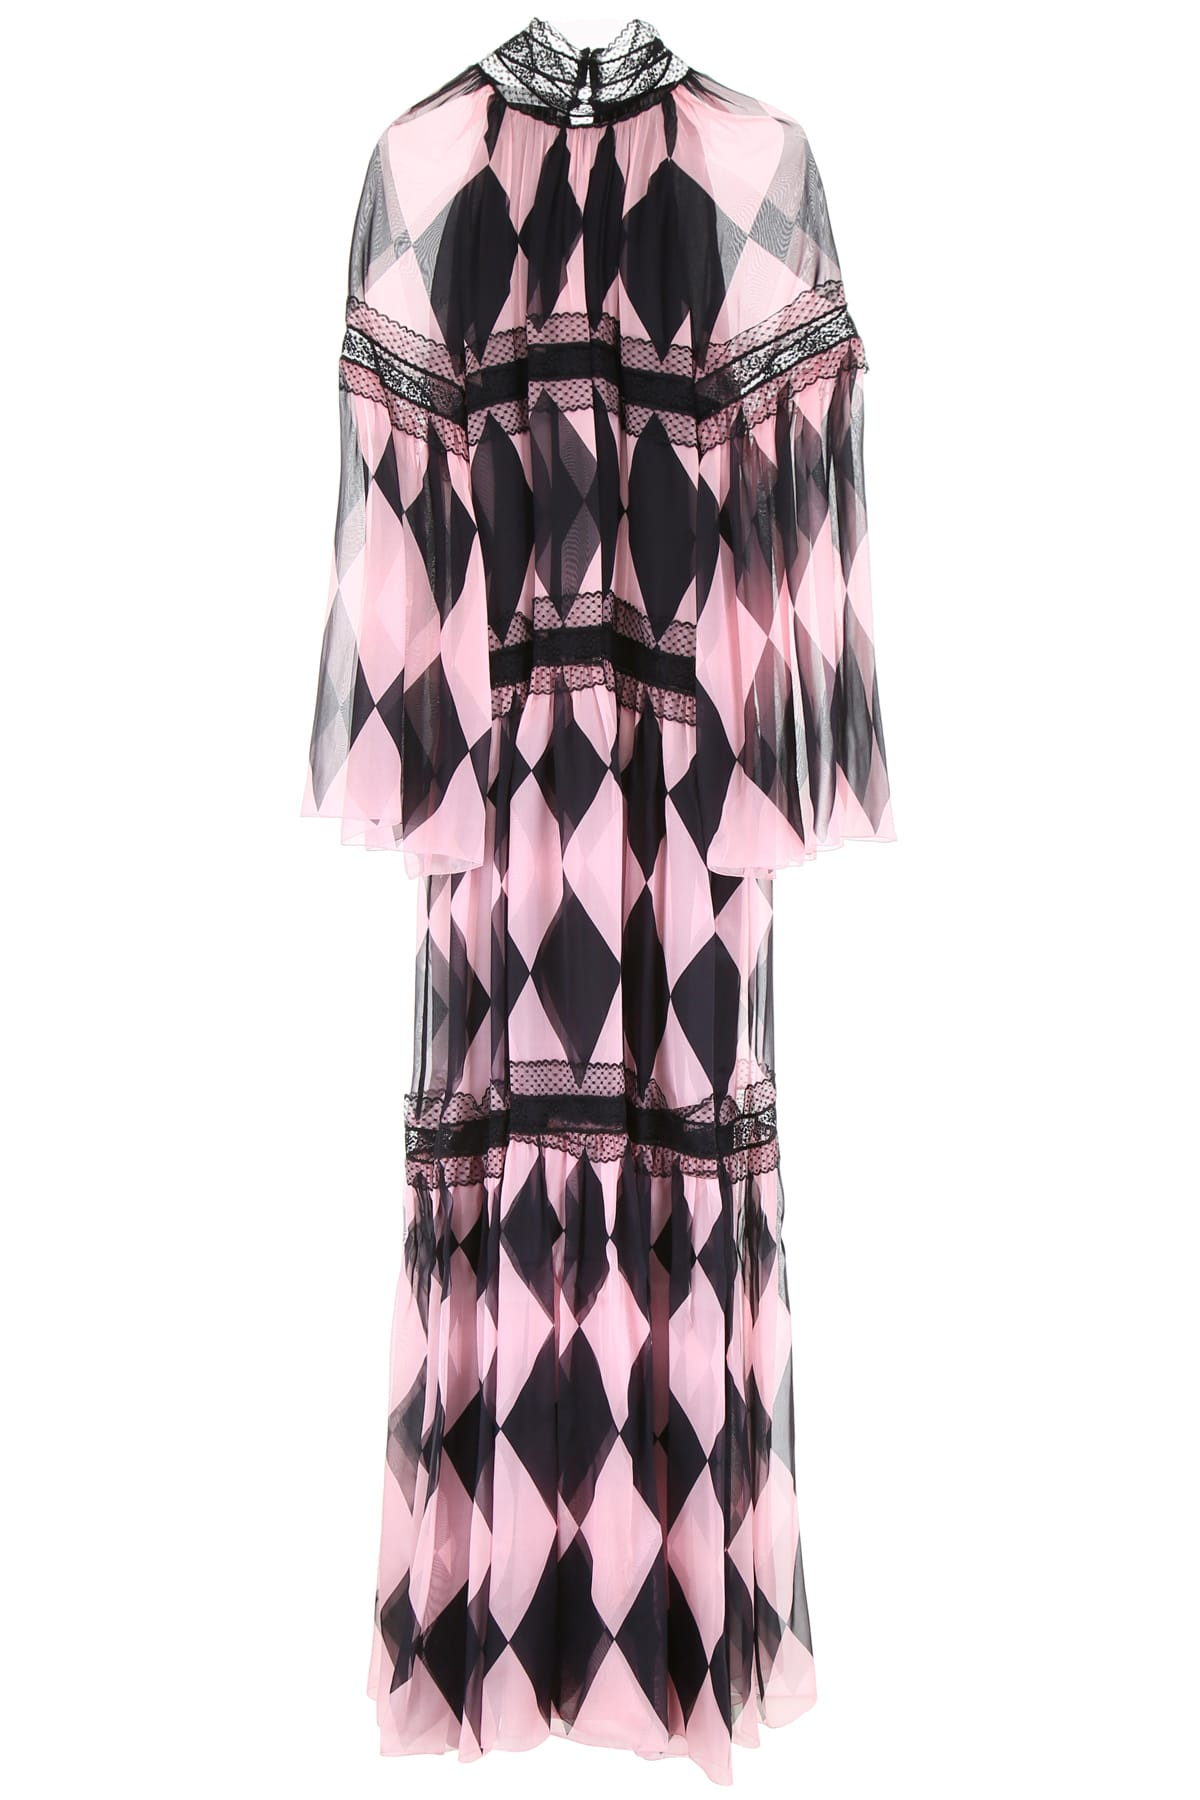 Philosophy di Lorenzo Serafini Printed Long Dress